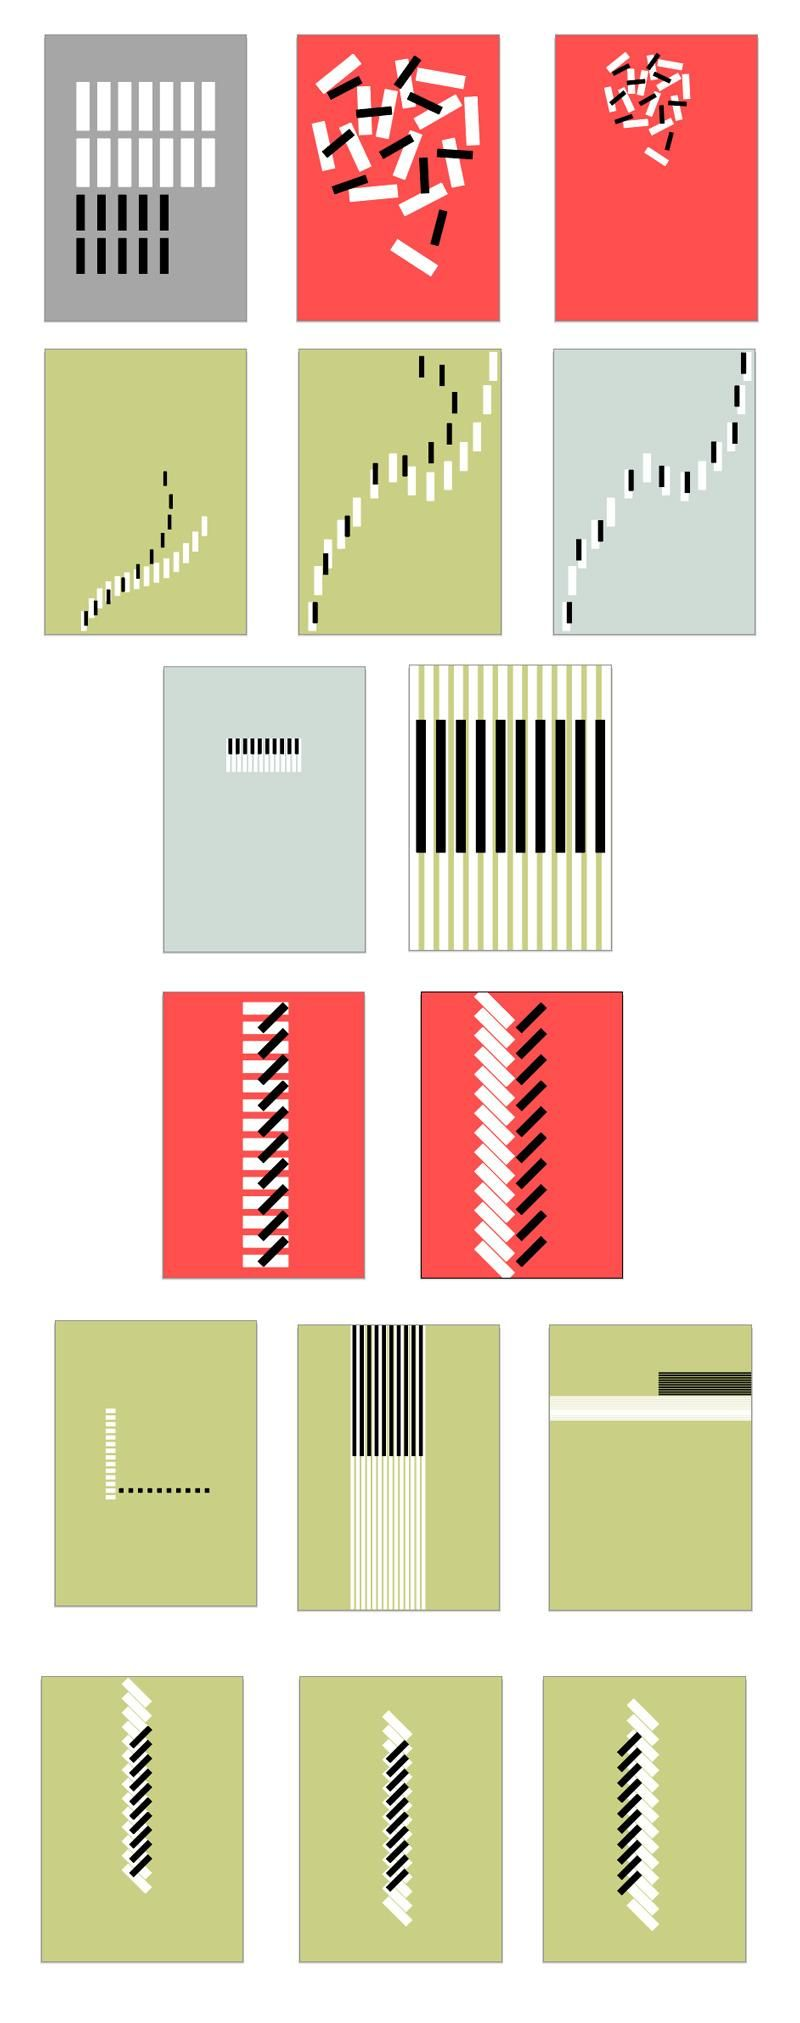 Explorative Design - image 9 - student project